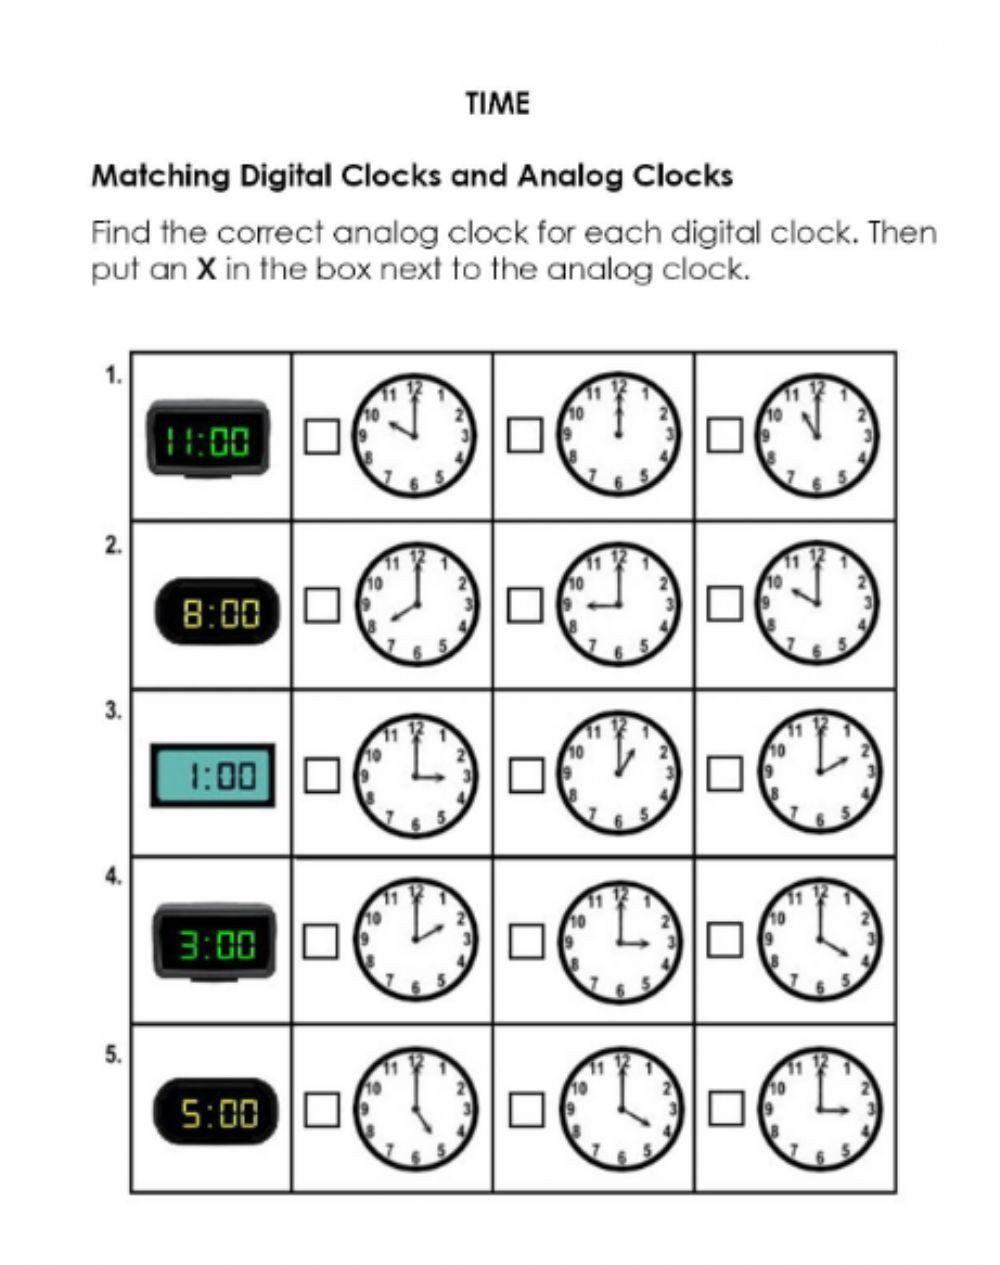 Analogue and Digital Clock Worksheets Match Digital and Analog Clocks  Interactive Worksheet   Clock worksheets [ 1265 x 1000 Pixel ]